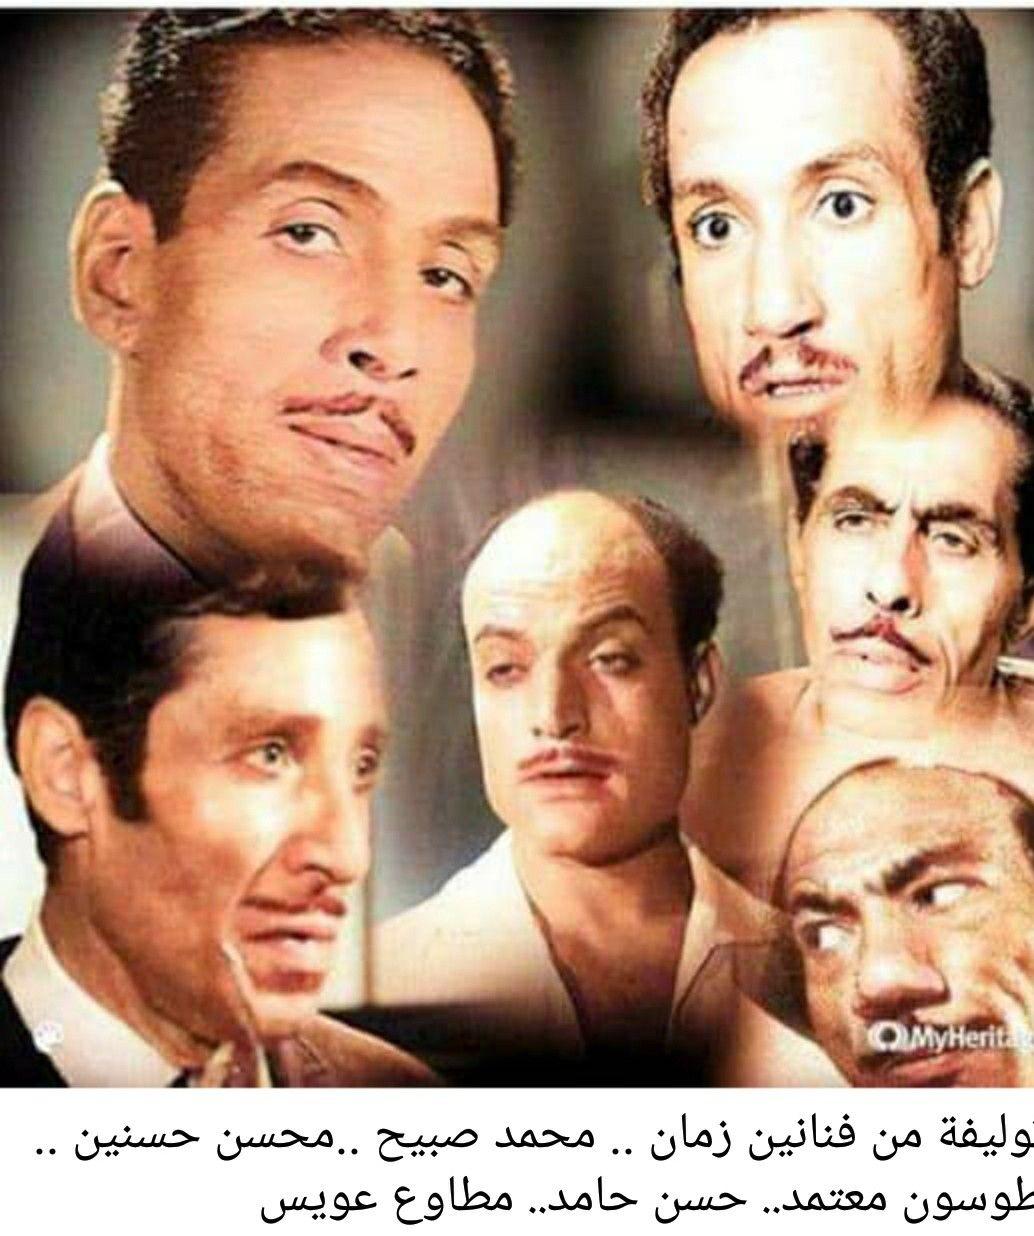 مجموعه من مشاهير الأدوار الثانويه Movie Posters Poster Movies